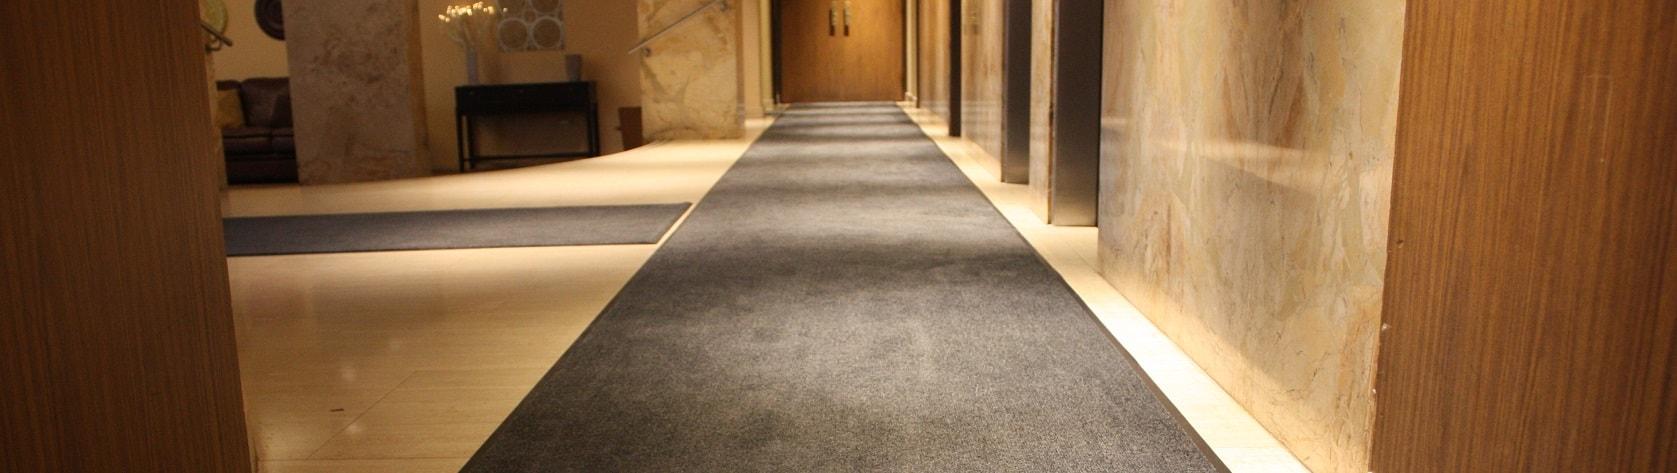 Rismat FloorGuard Matting System